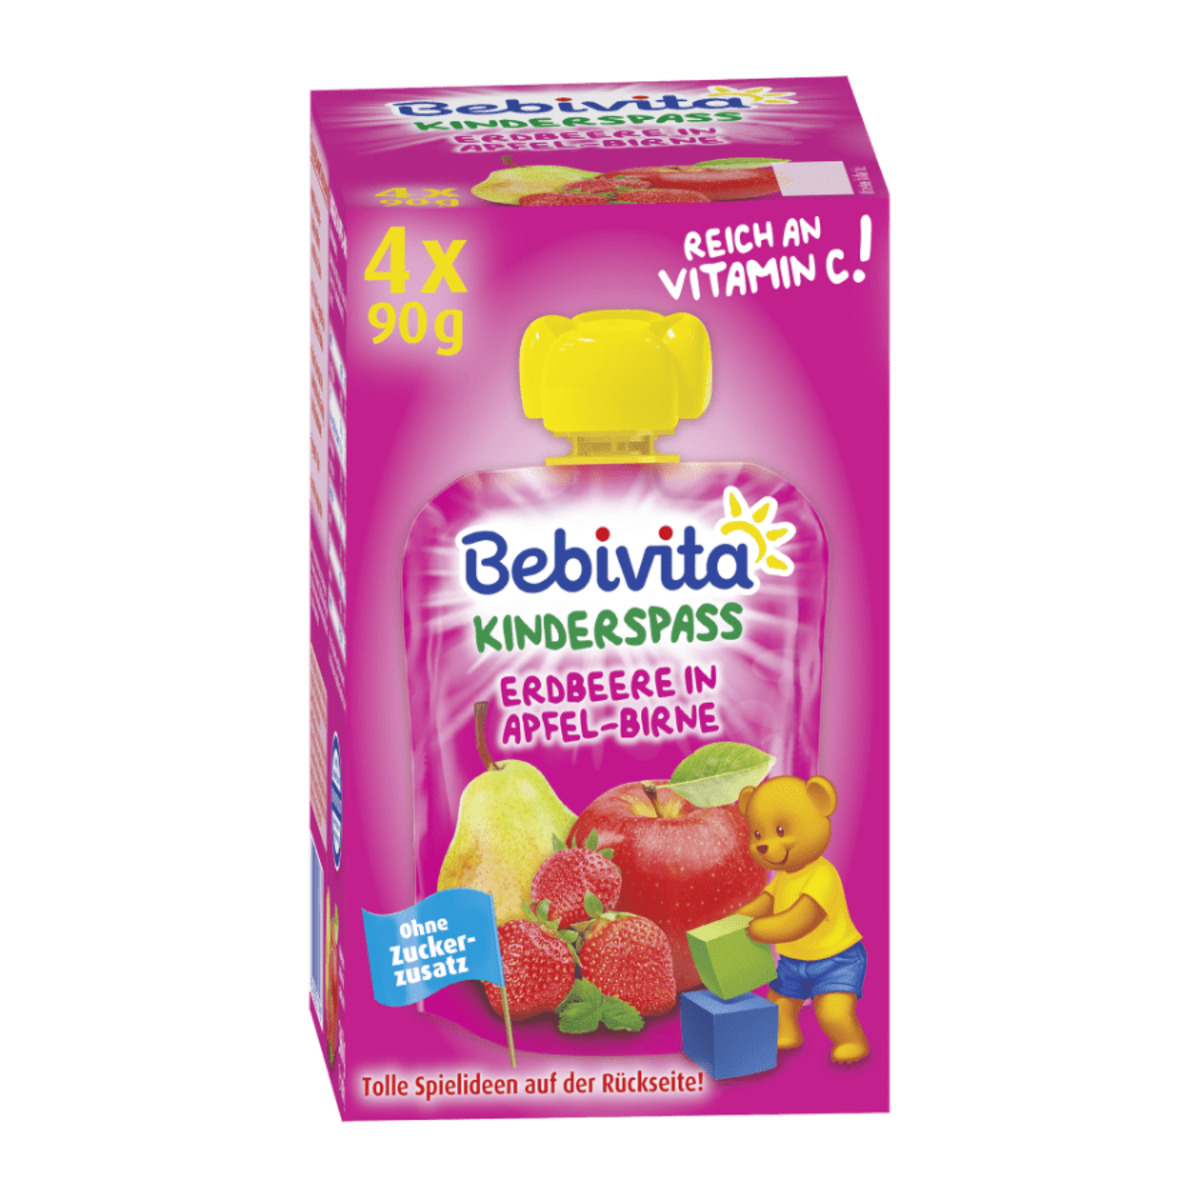 Bild 2 von Bebivita Kinderspaß